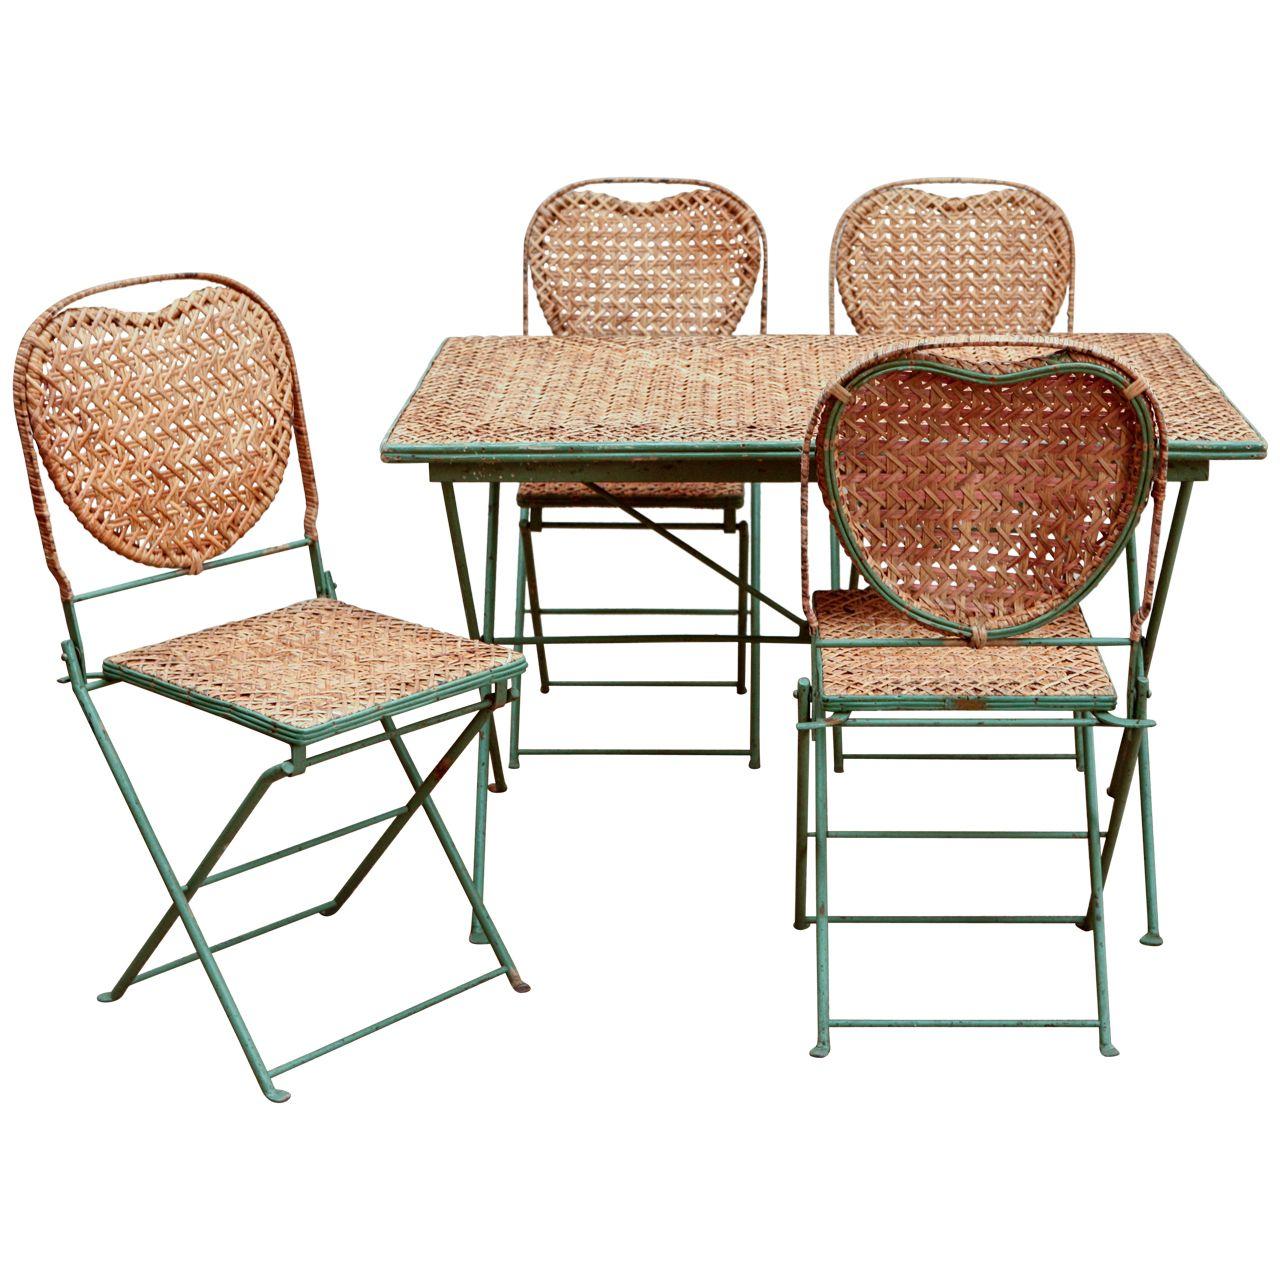 Vintage Rattan Garden Table Set